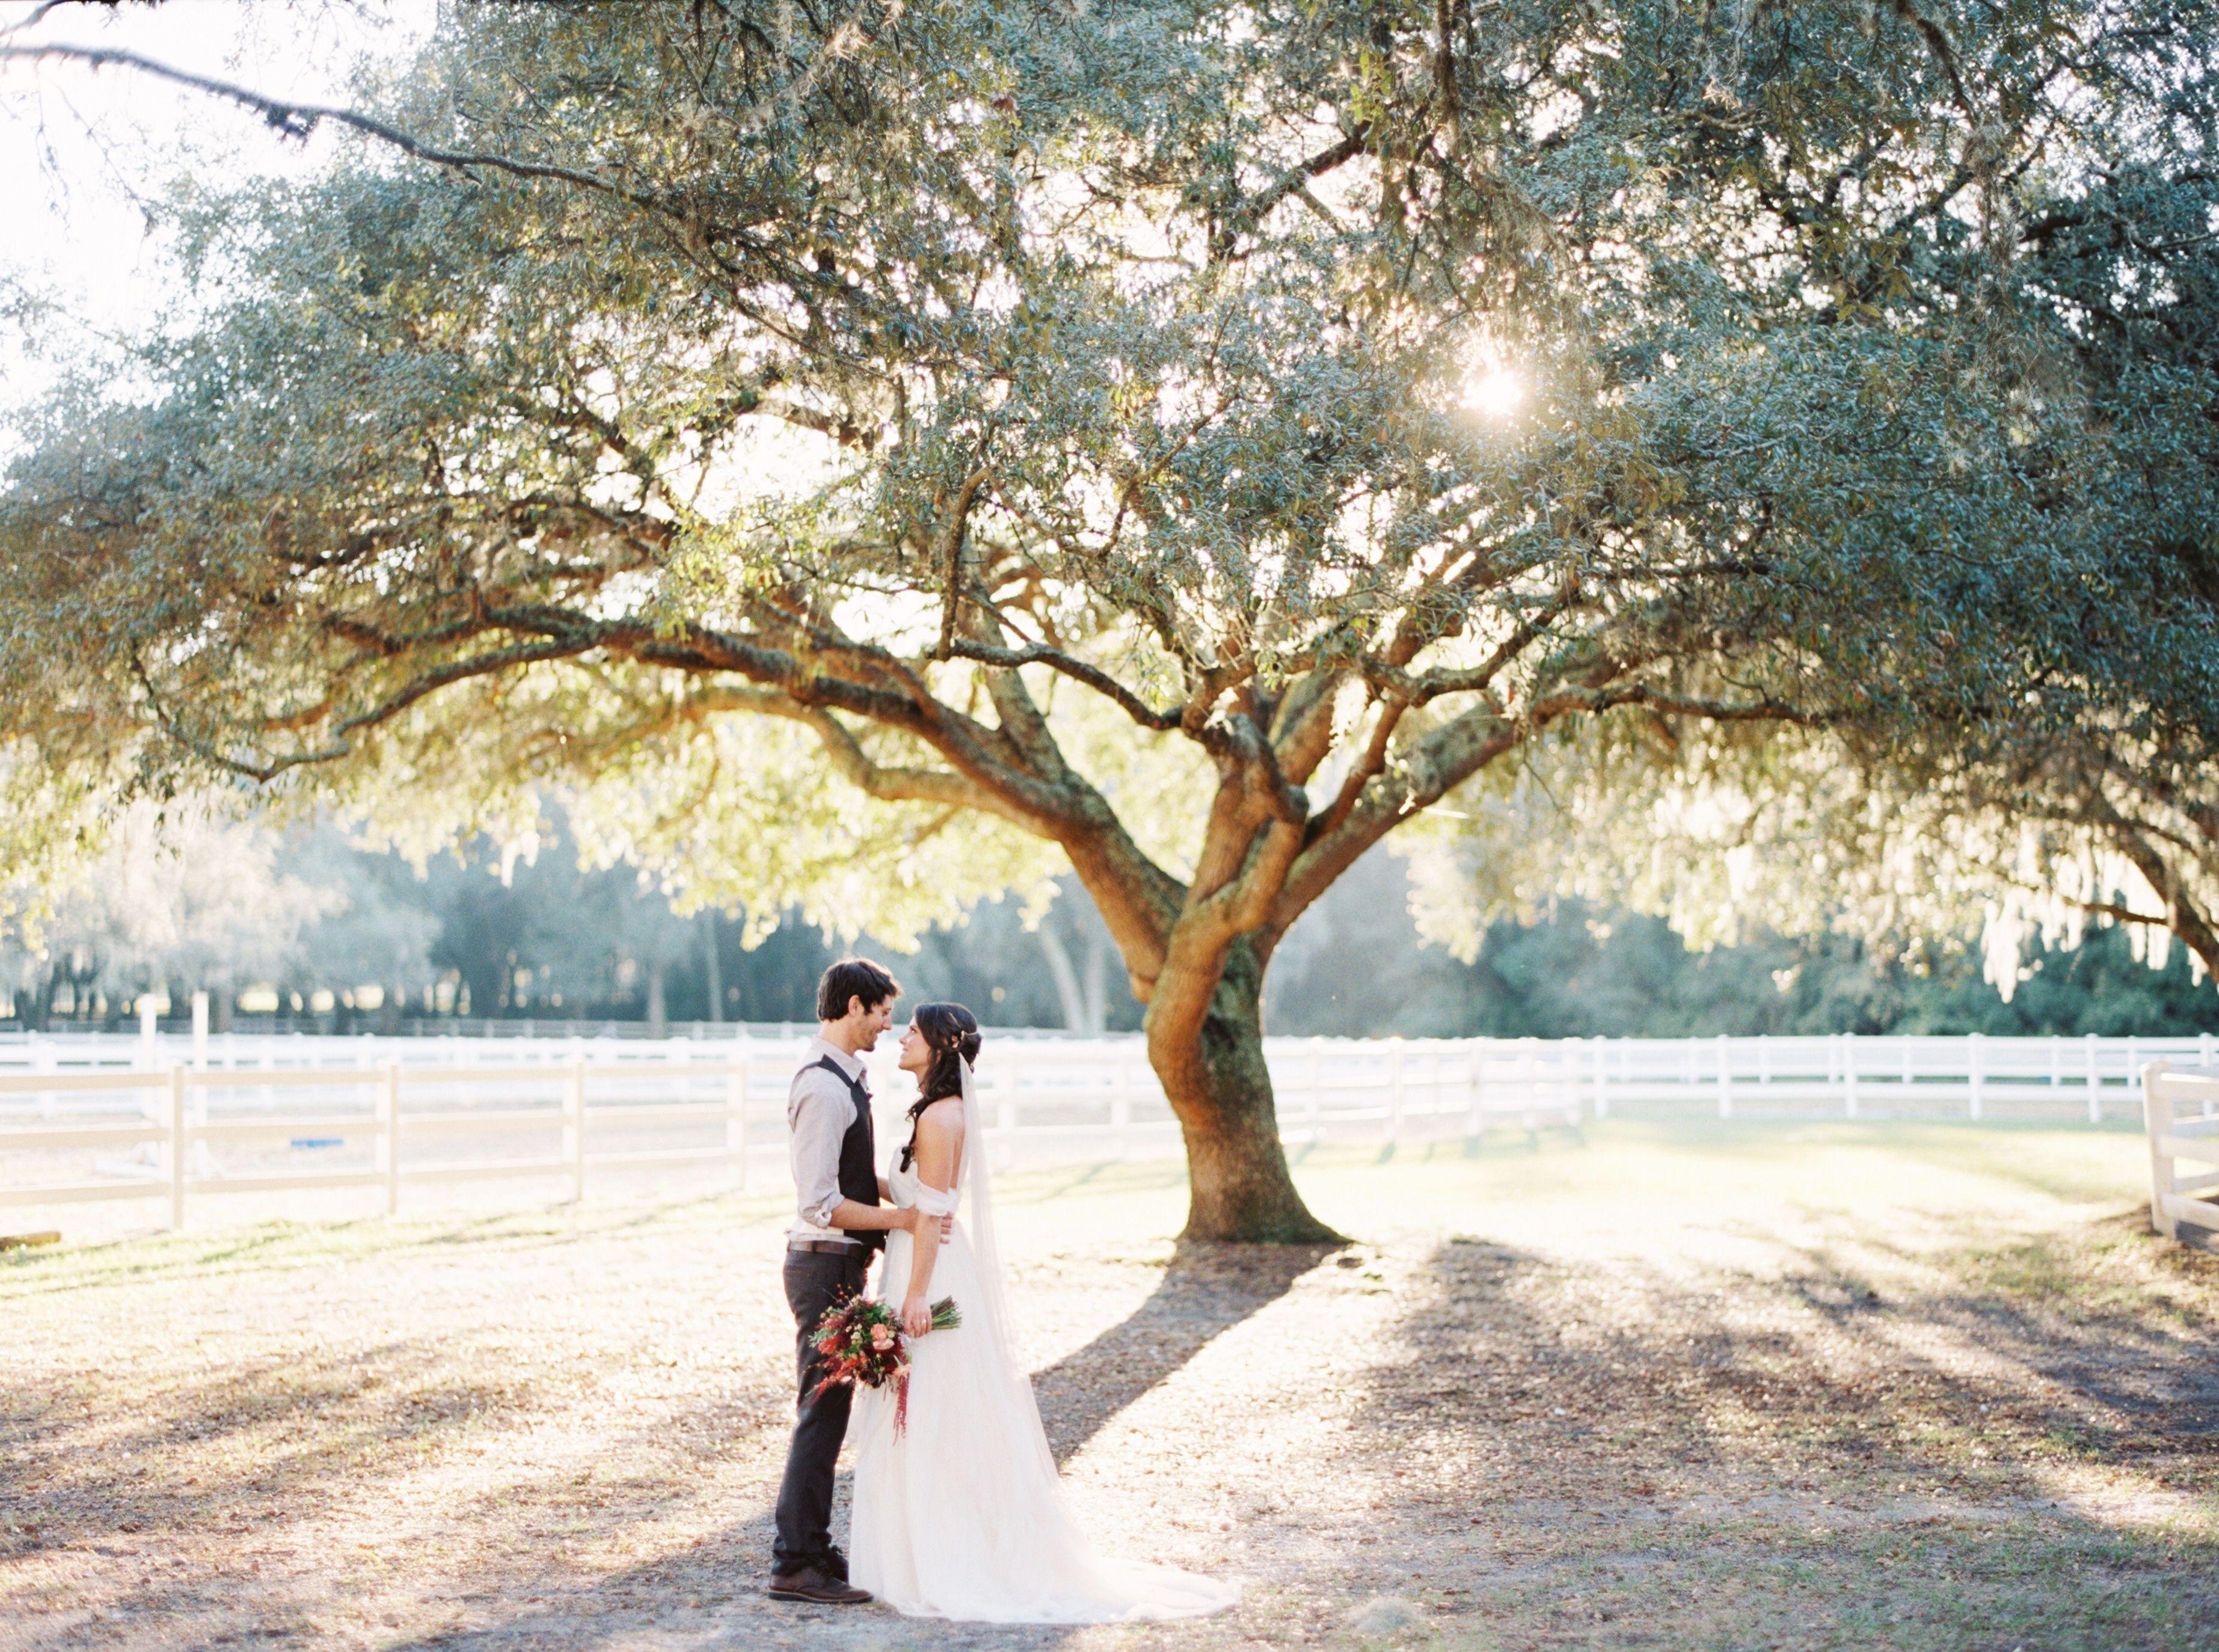 A Natural Fall Wedding At The Lange Farm In Dade City Florida